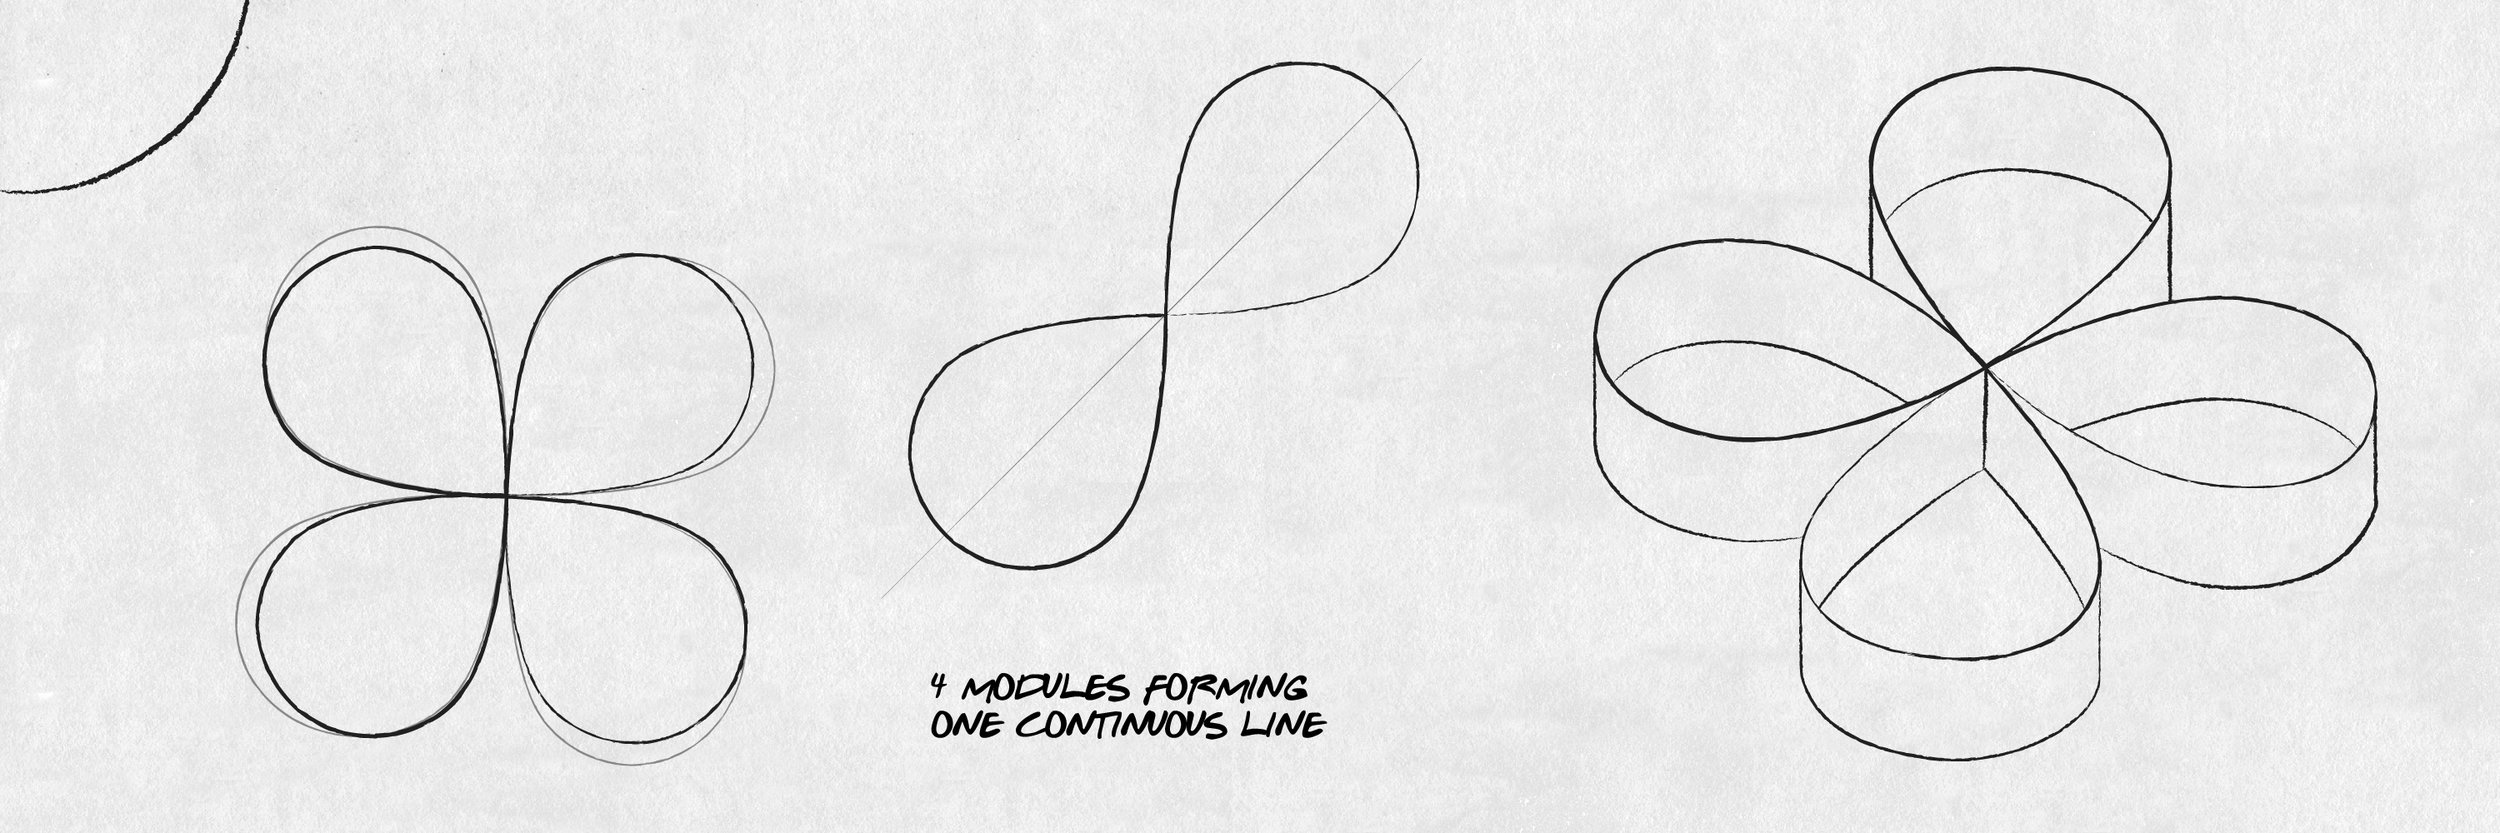 Jones-and-Partners-Swirl-lighting-sketch.jpg